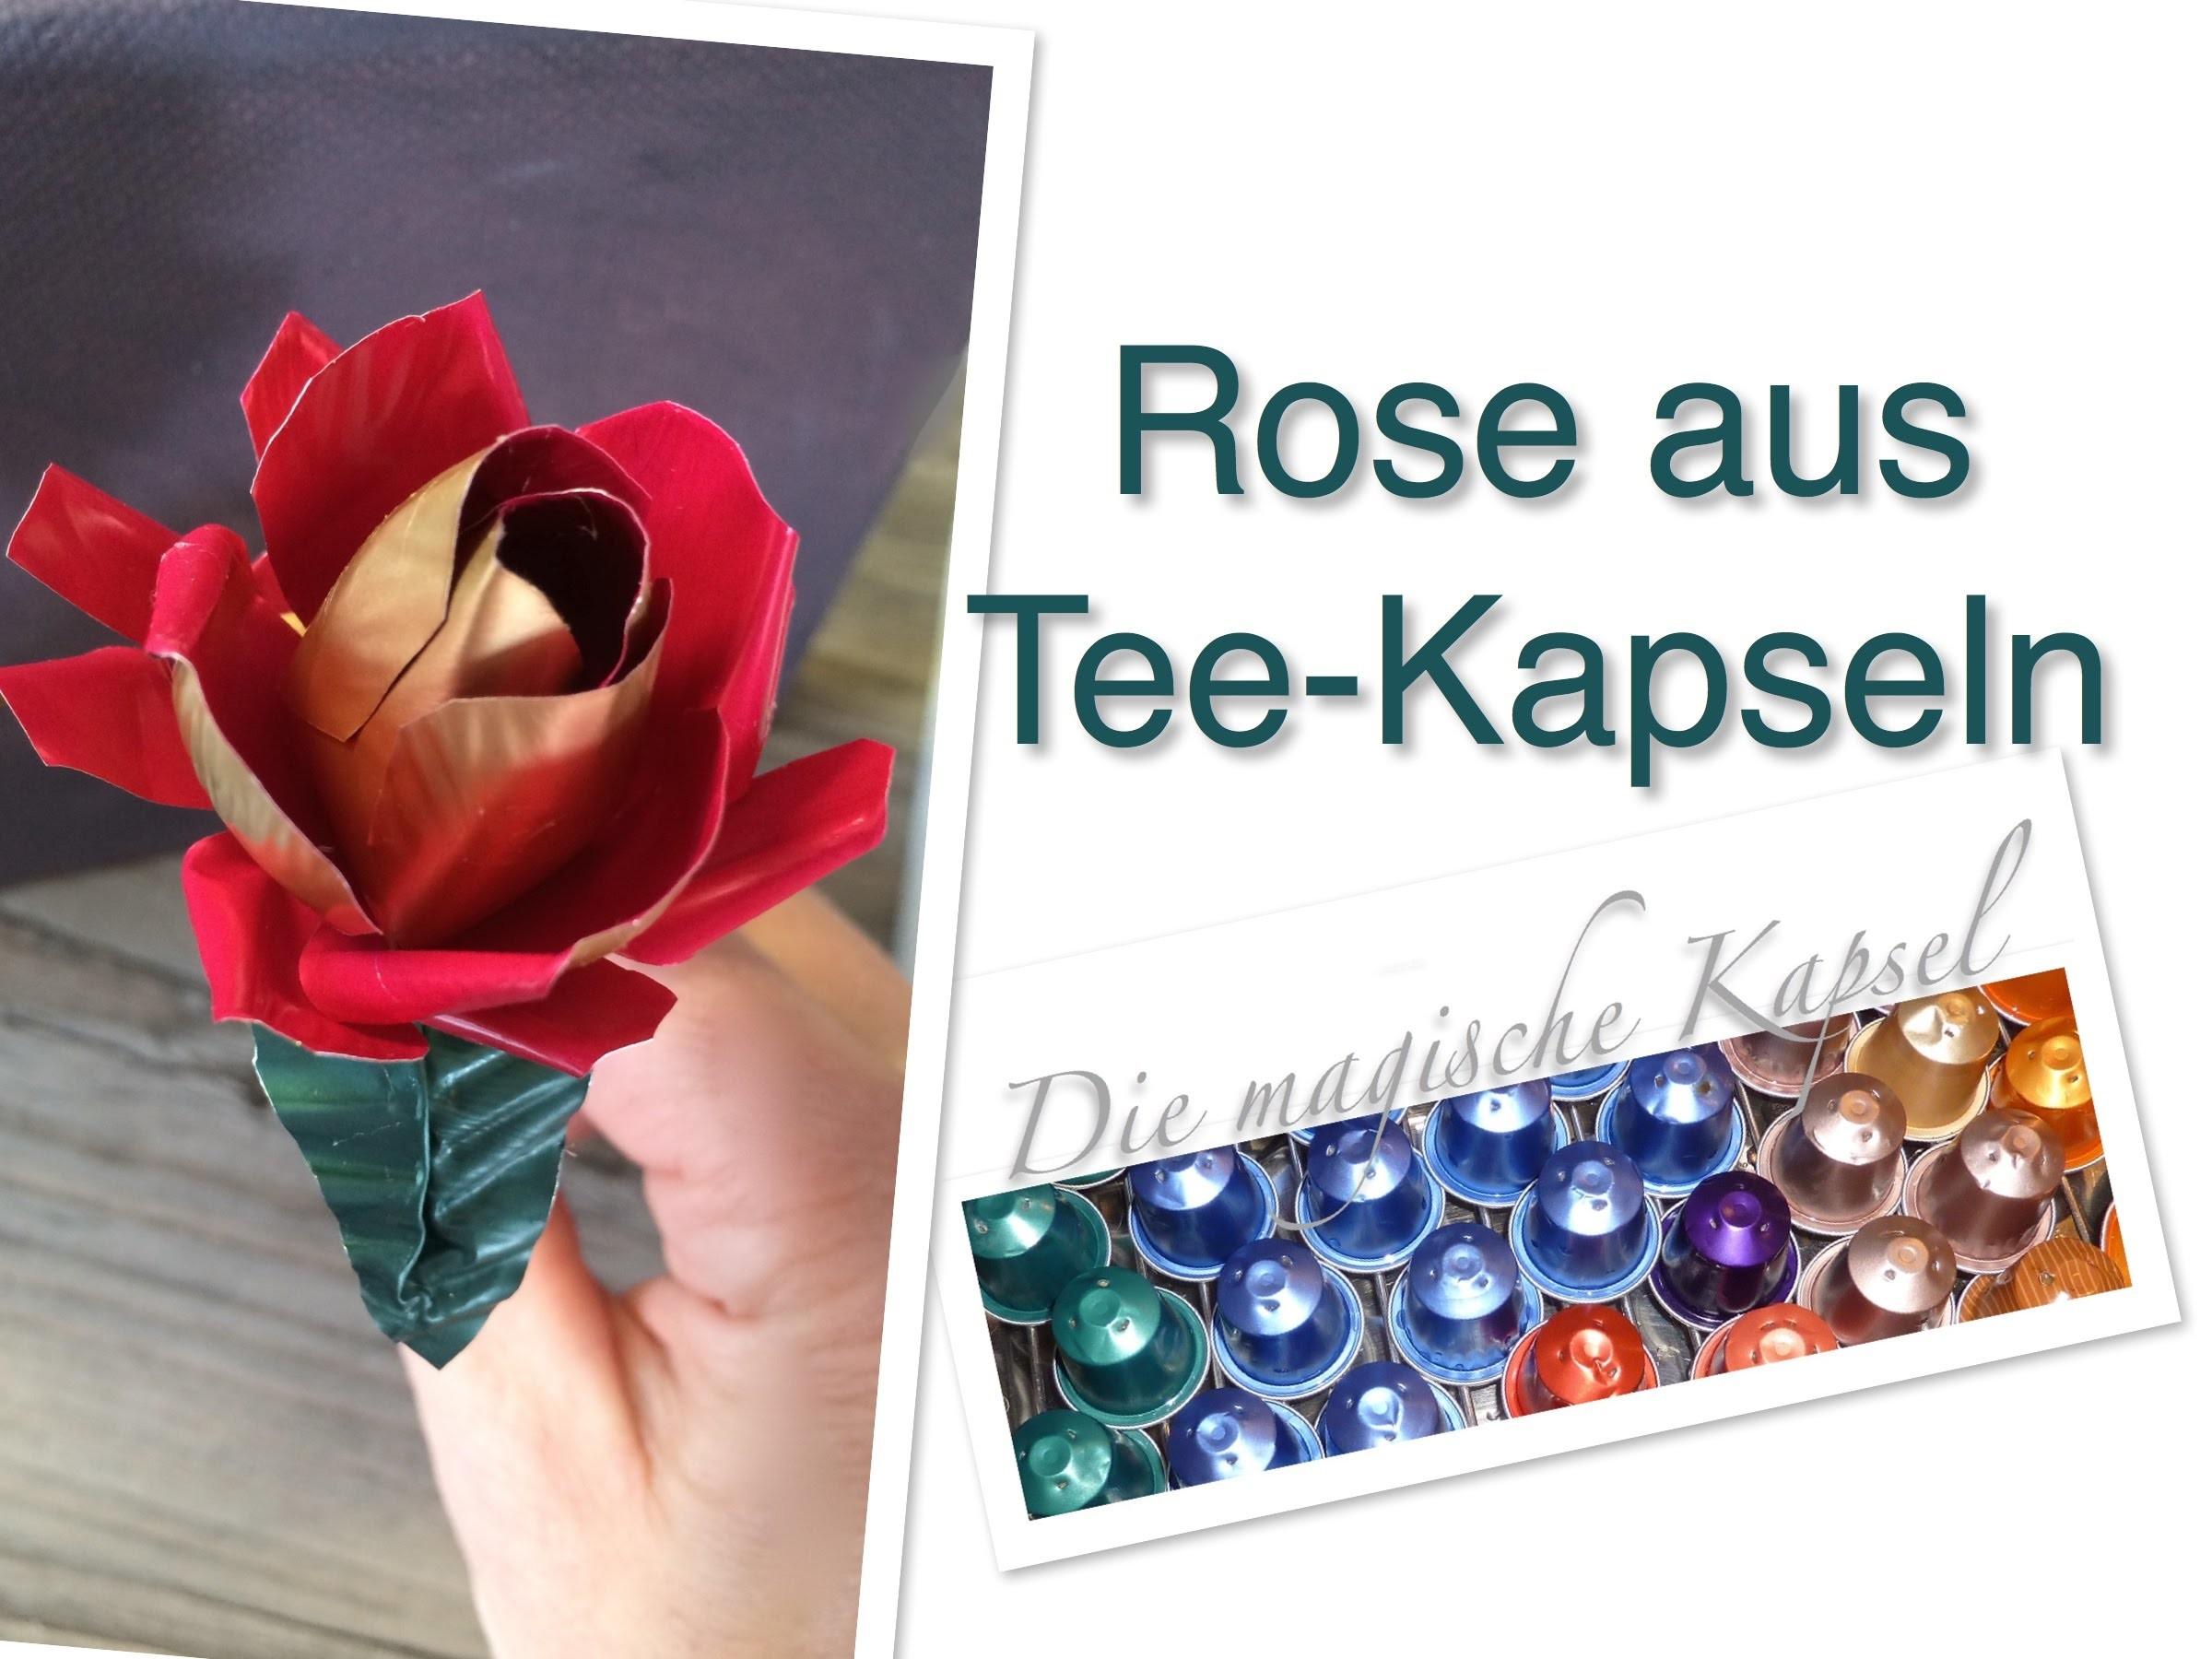 Nestle-T Kapsel Schmuck Anleitung - Rose aus Teekapseln - die magische (Tee)-Kapsel